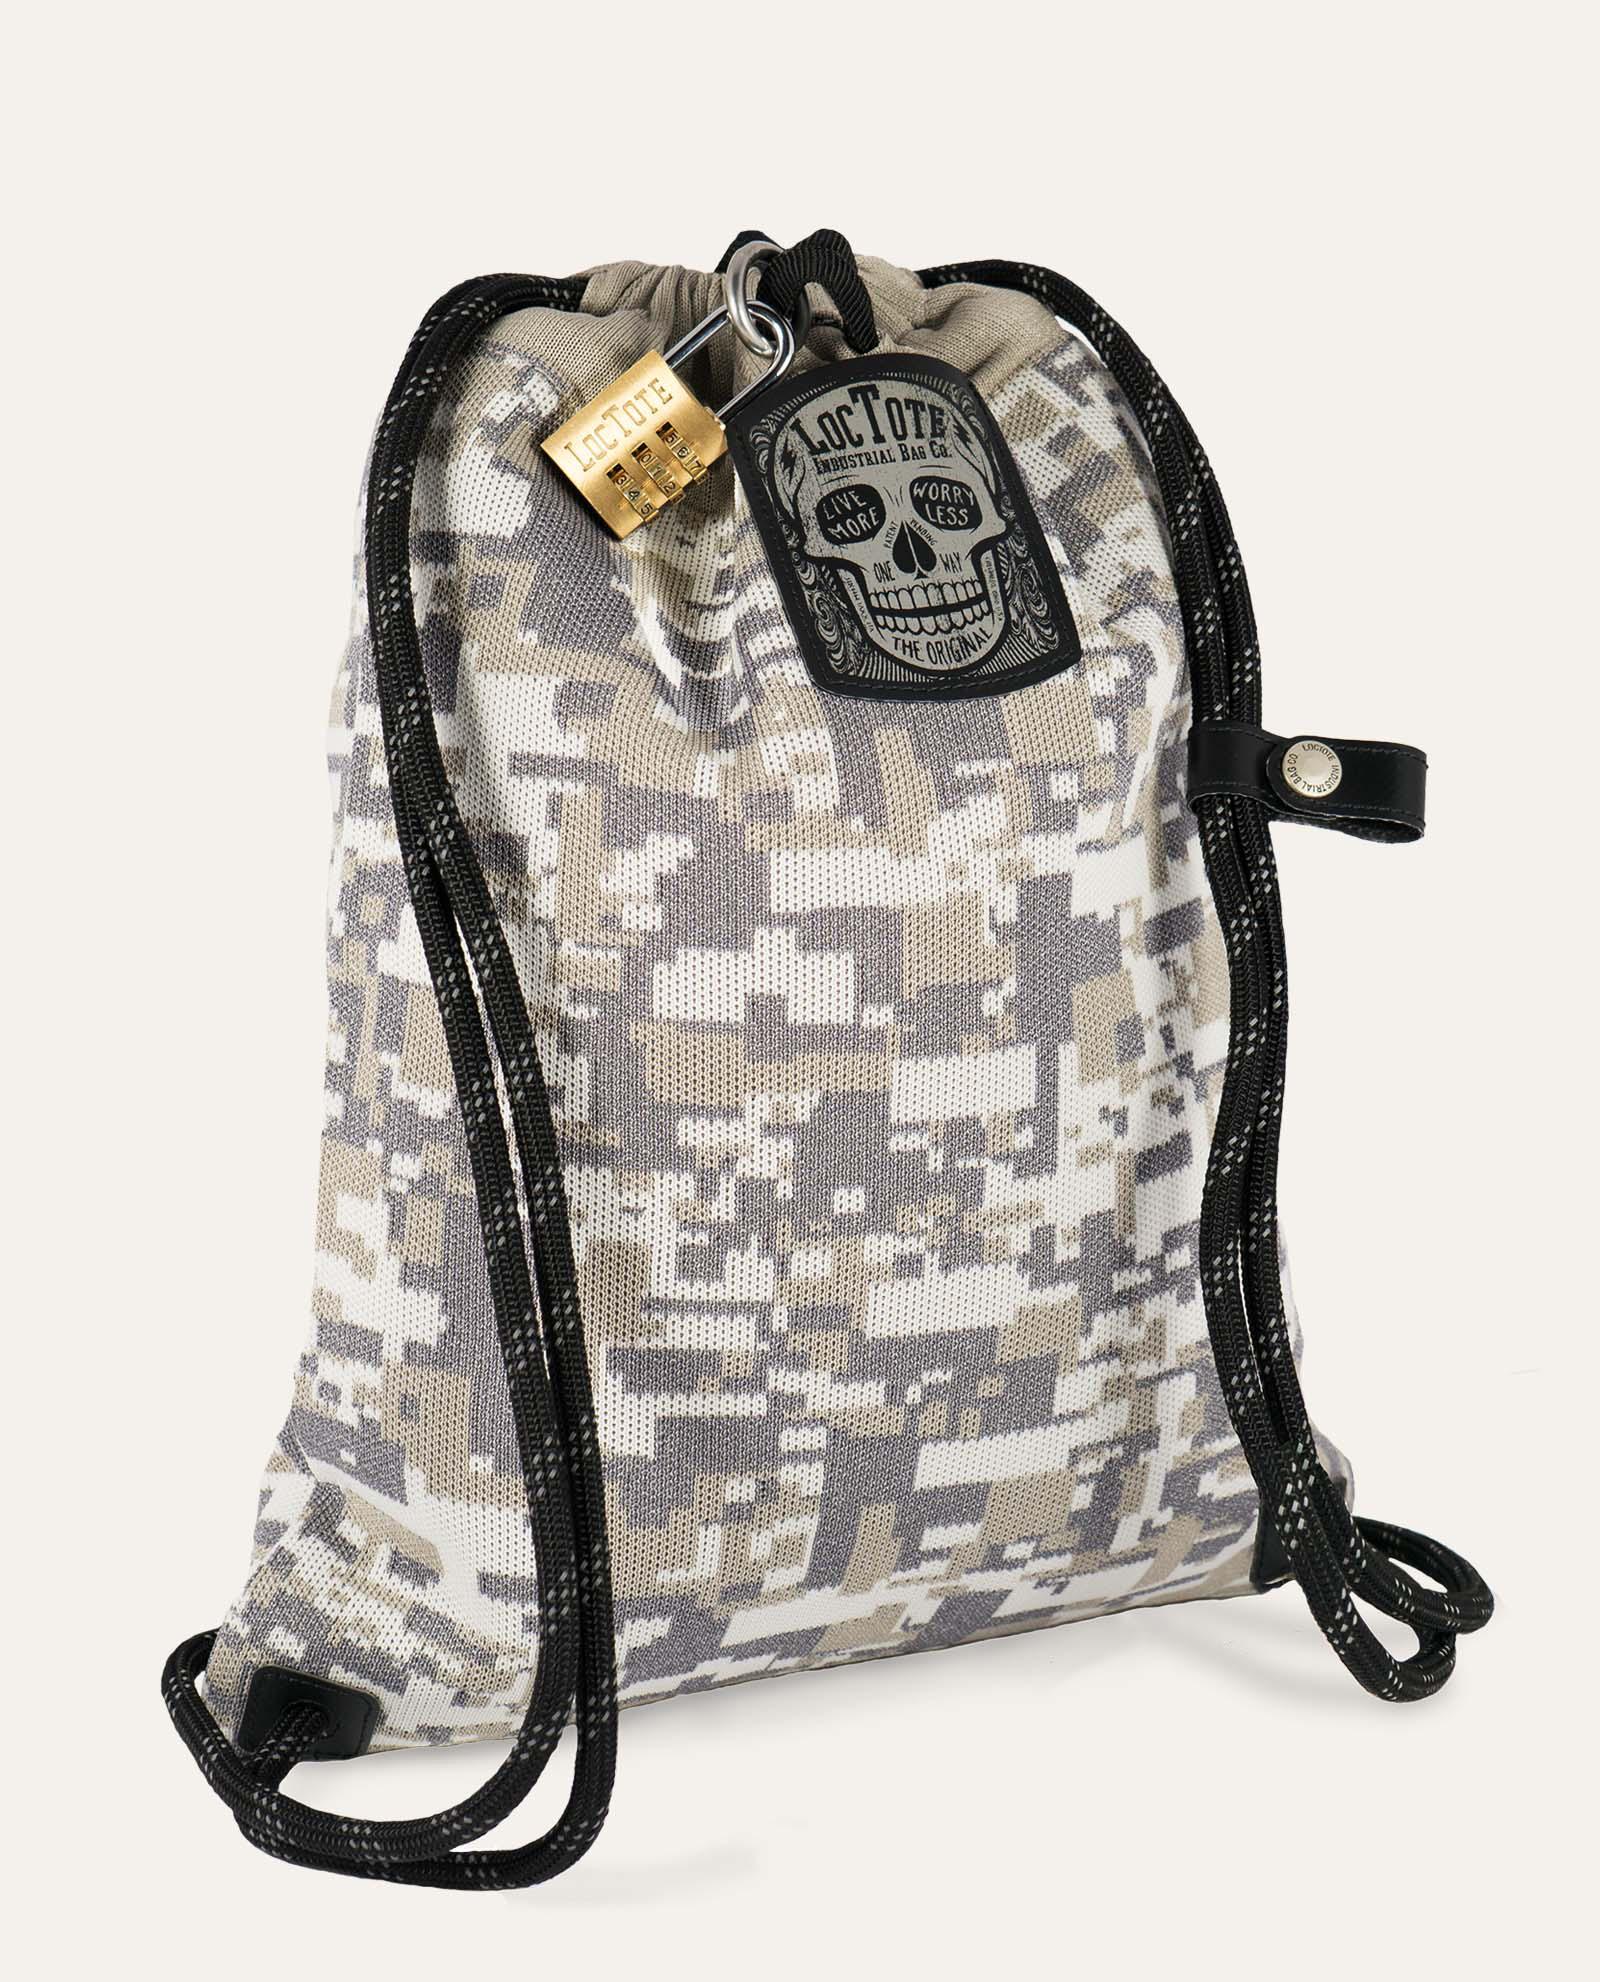 Travel Theft Resistant Bag